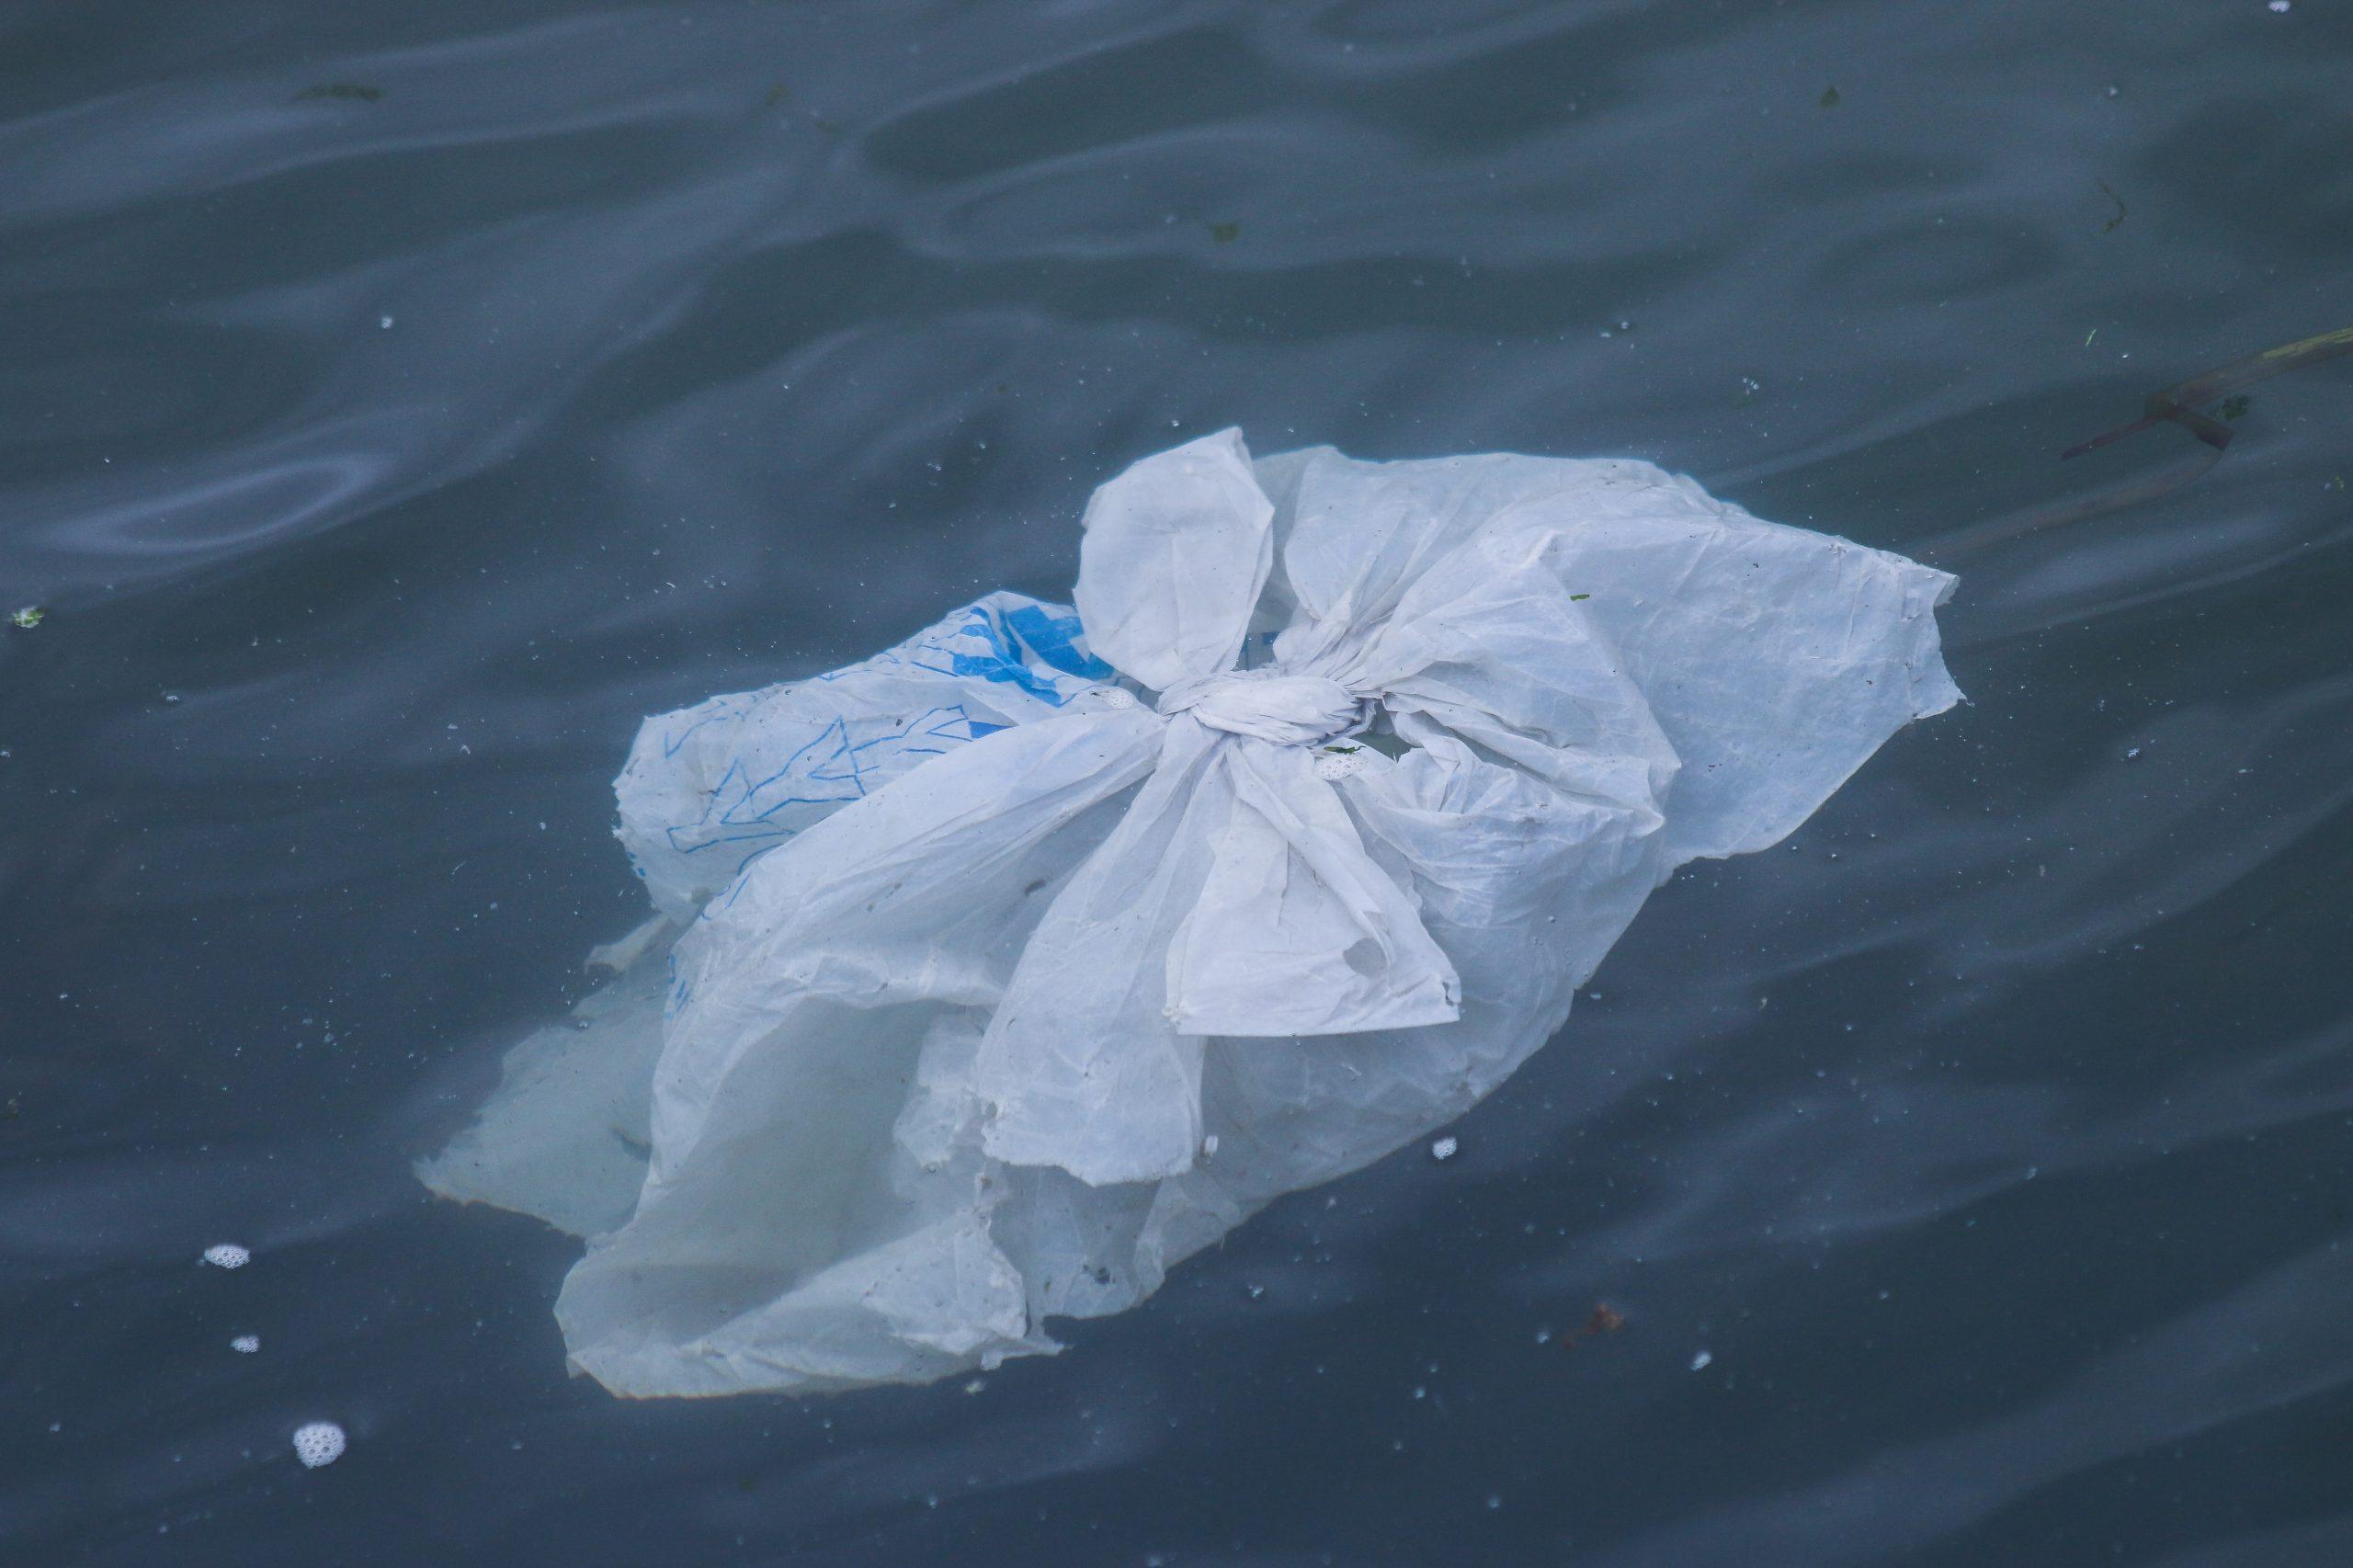 Ende 2020: China verbietet Einweg-Plastik